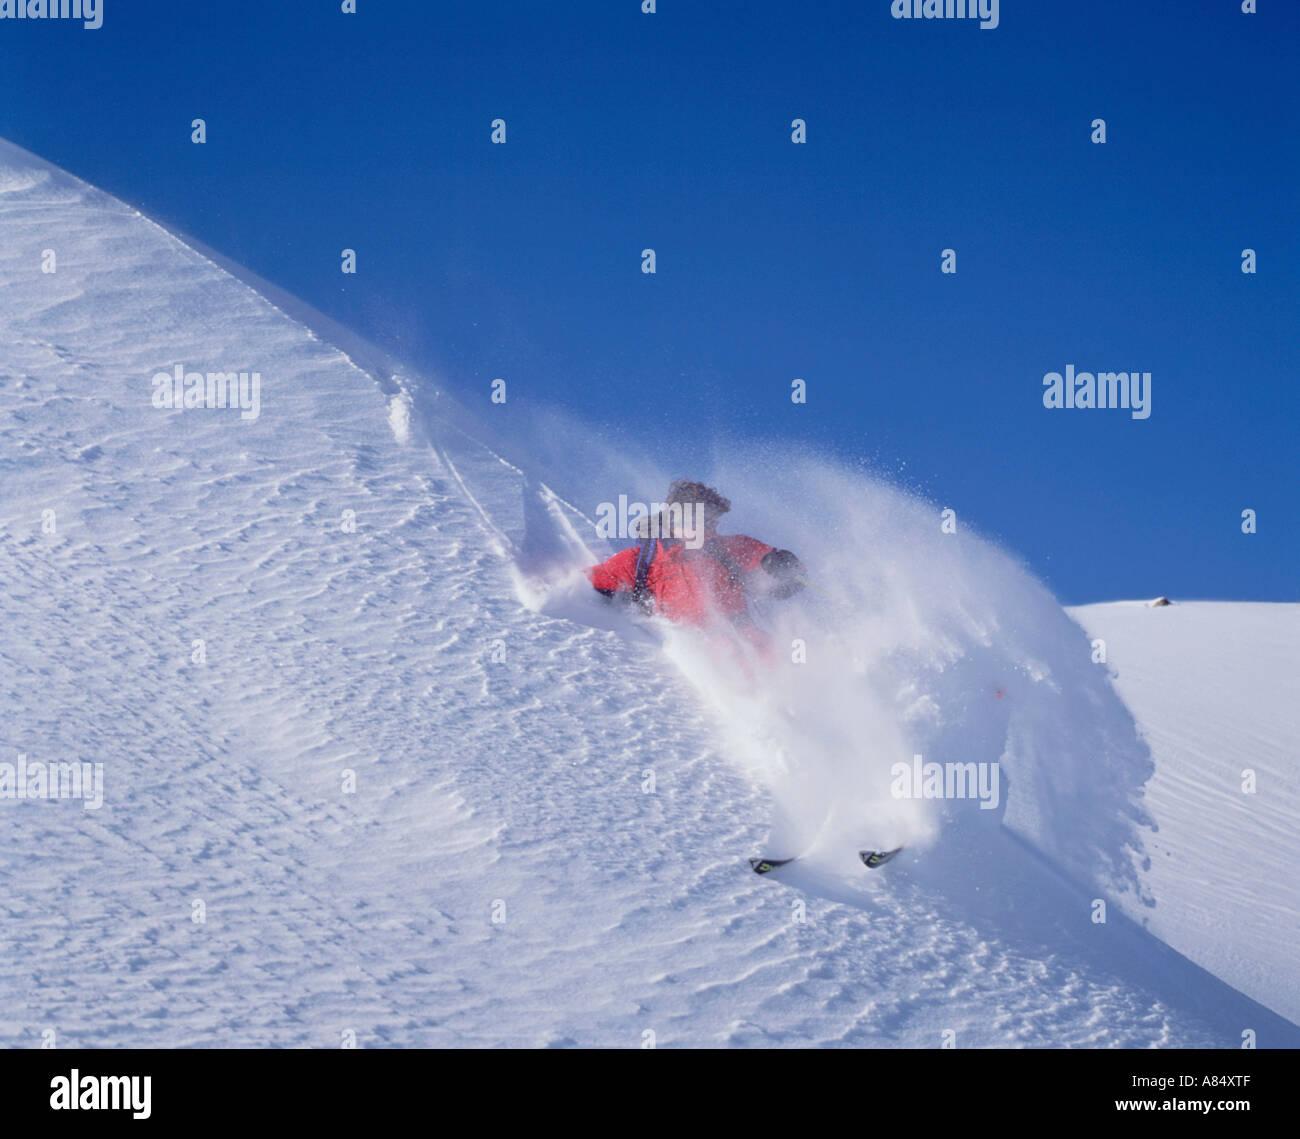 Switzerland. Downhill skier in the Alps. - Stock Image